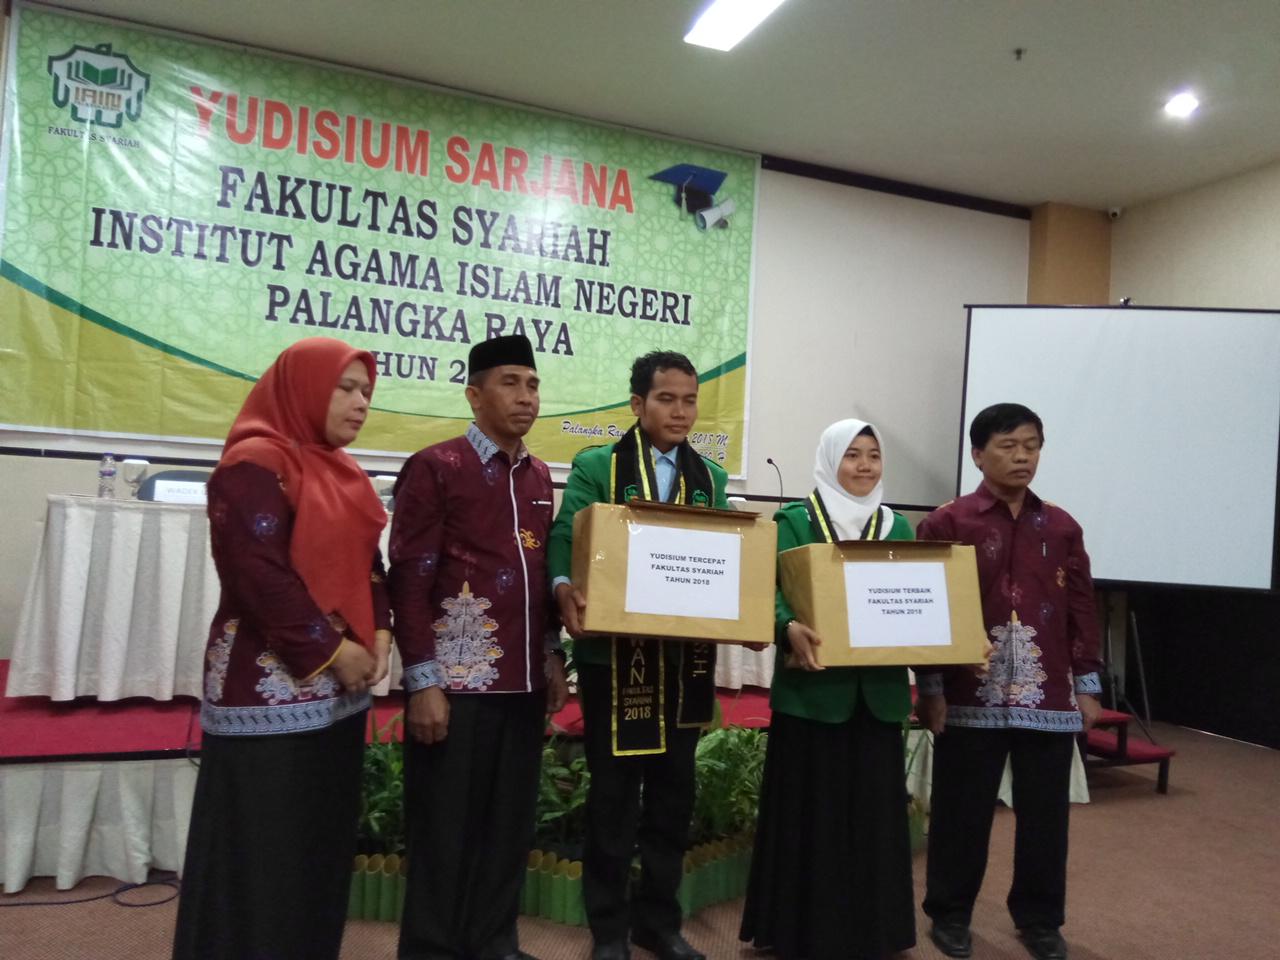 Yudisium Fakultas Syariah 2018